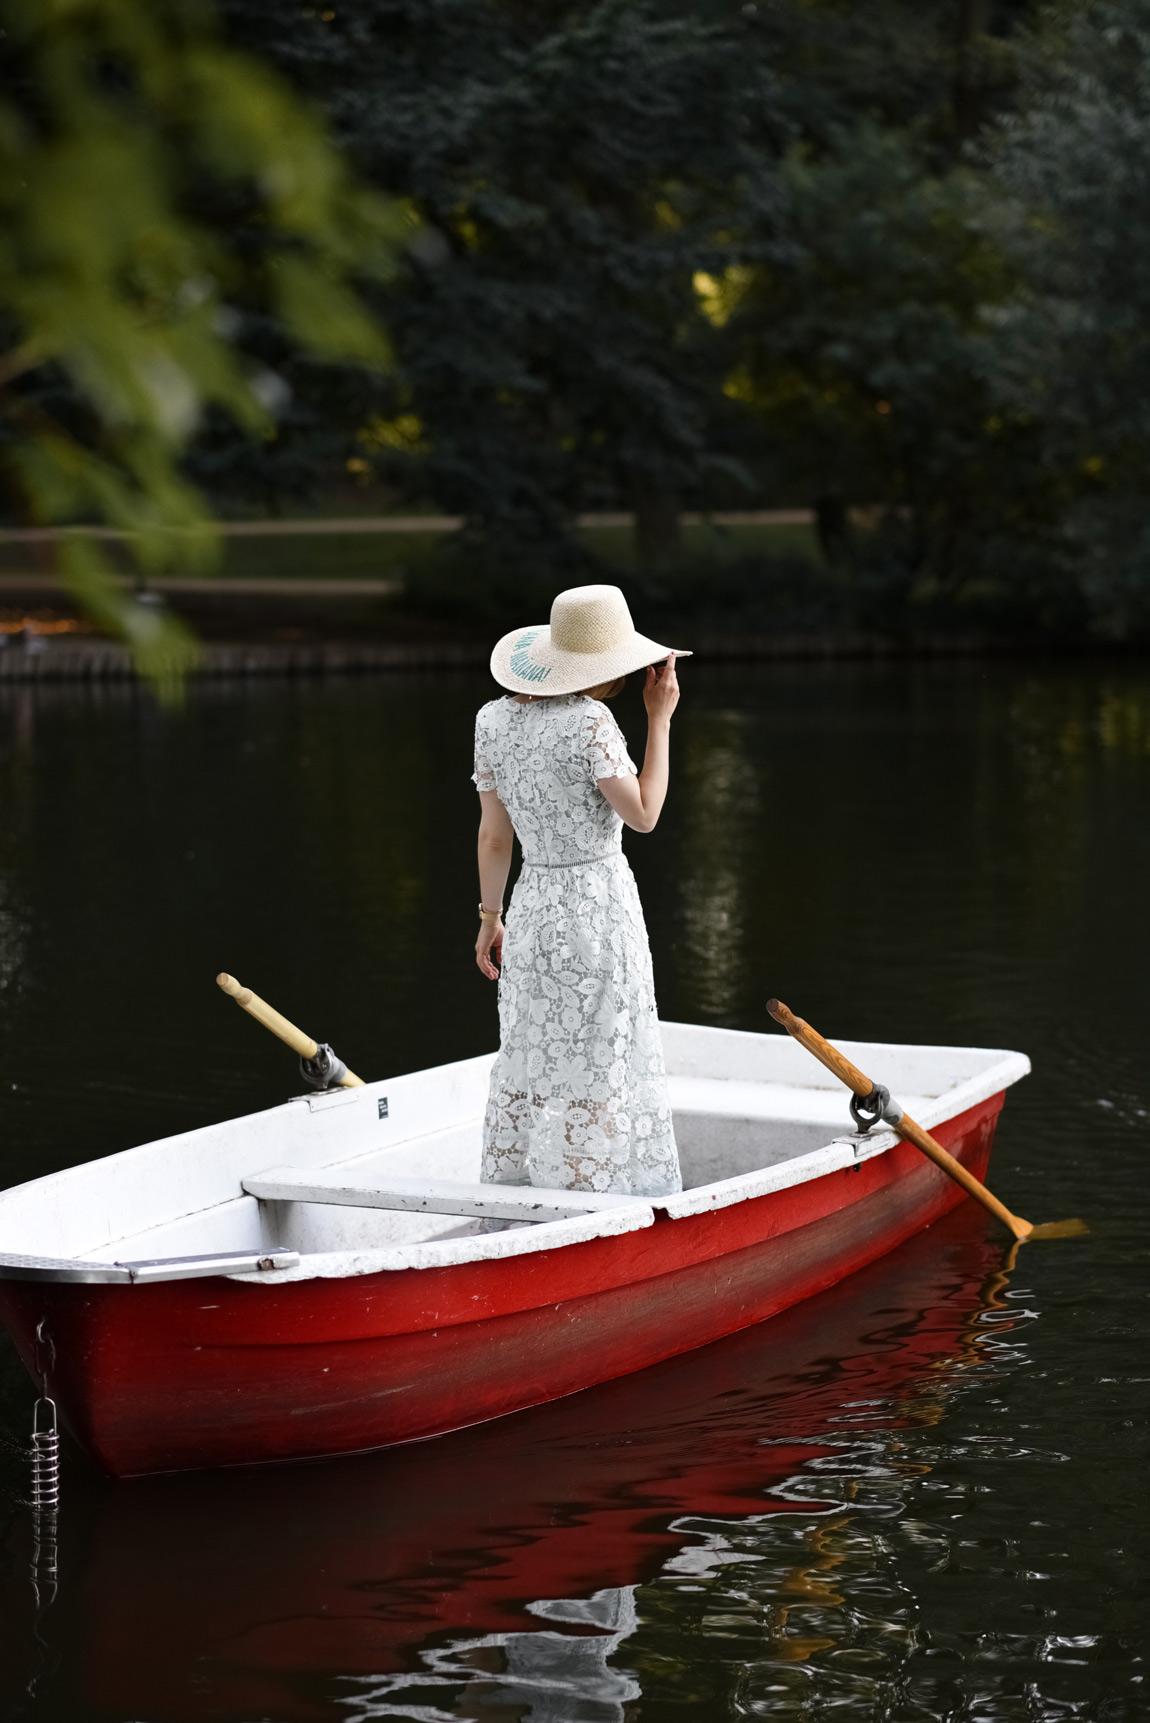 spitzen, kleid, berlin, see, boot, ruderboot, outfit, romantisch, fashionblogger, modeblogger, sommr